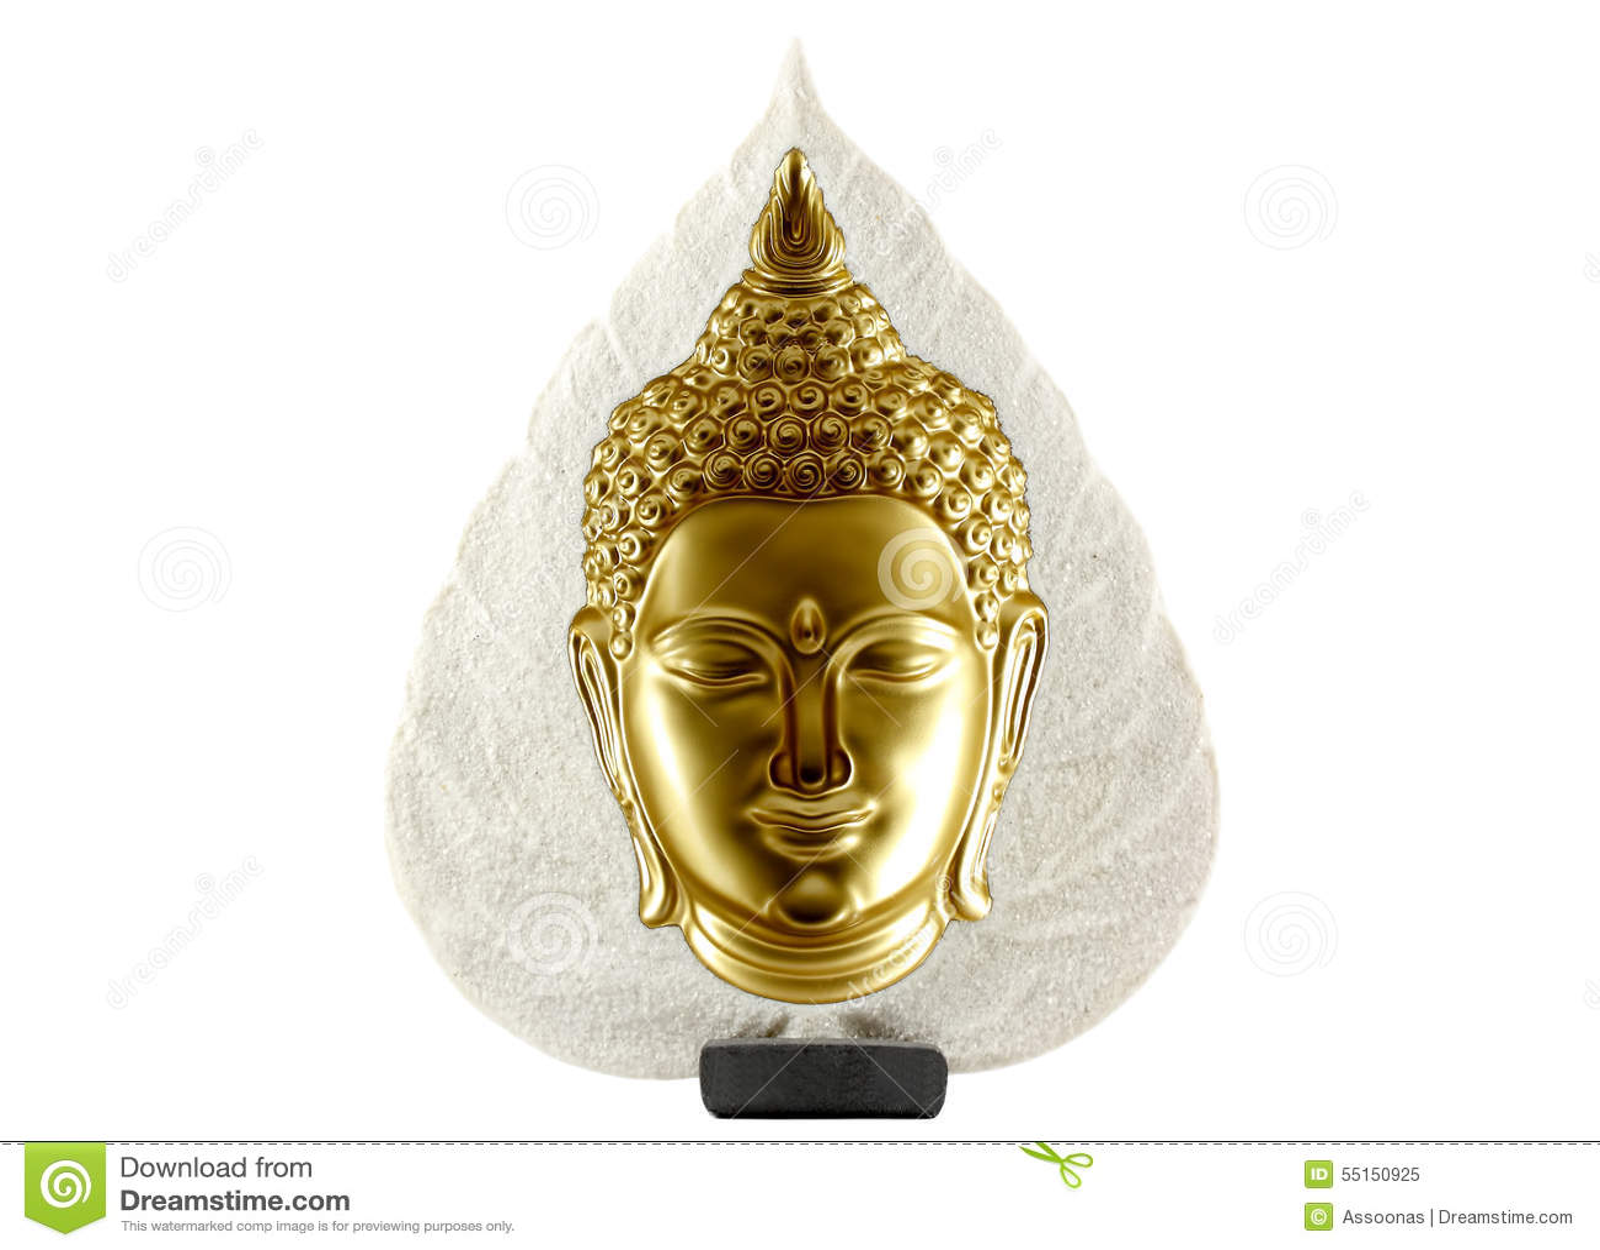 Estatua de Buddha aislada